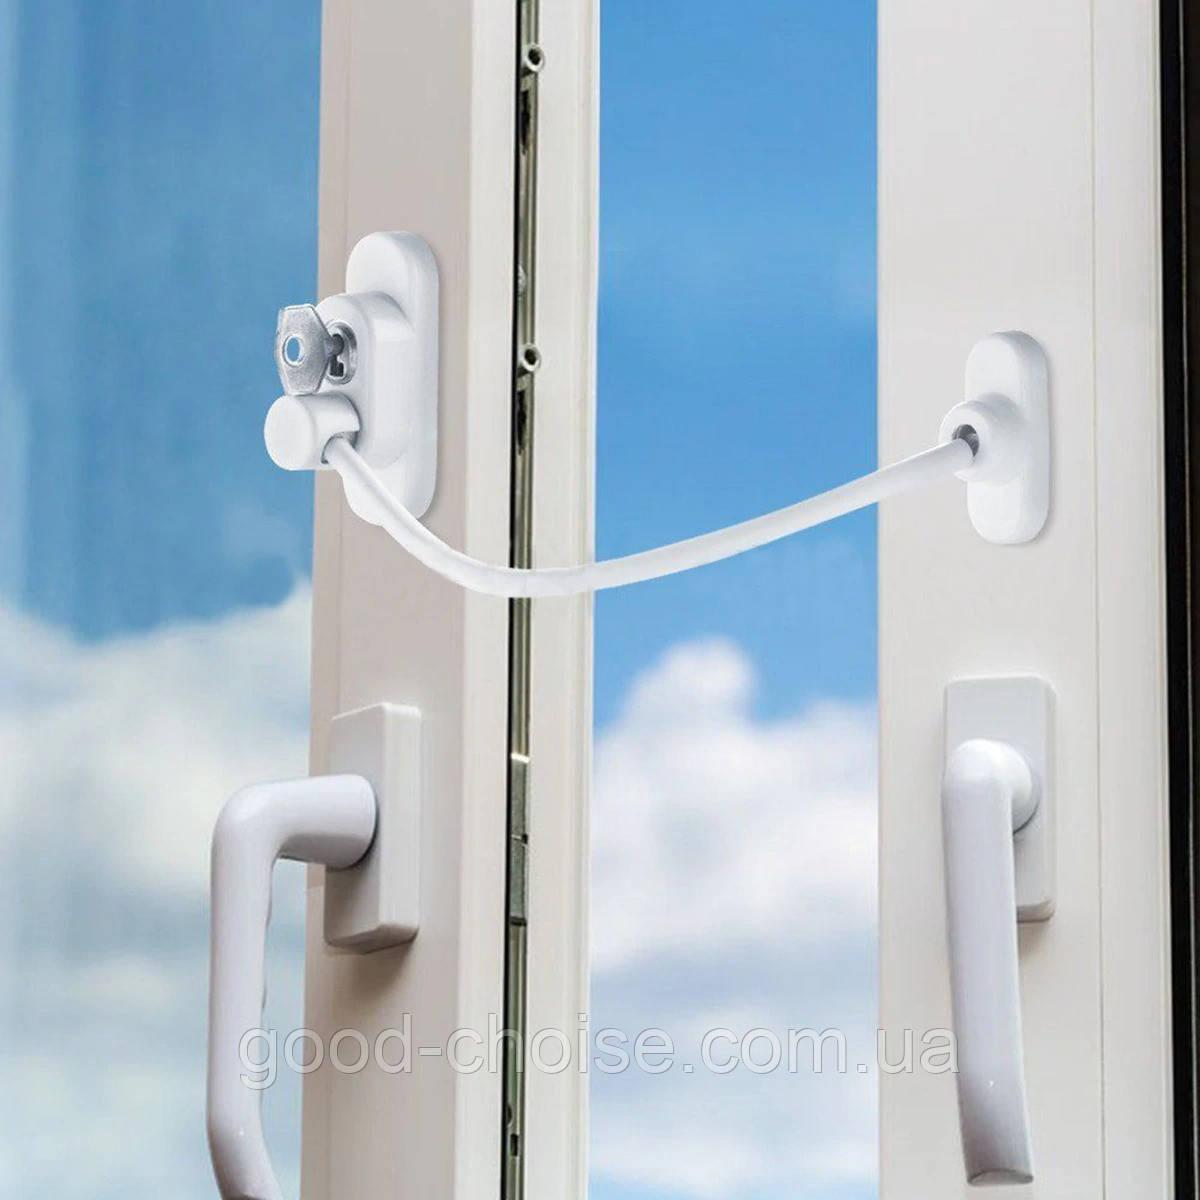 Блокиратор для окон от детей WINDOW Restrictor / Замок блокиратор на окна белый